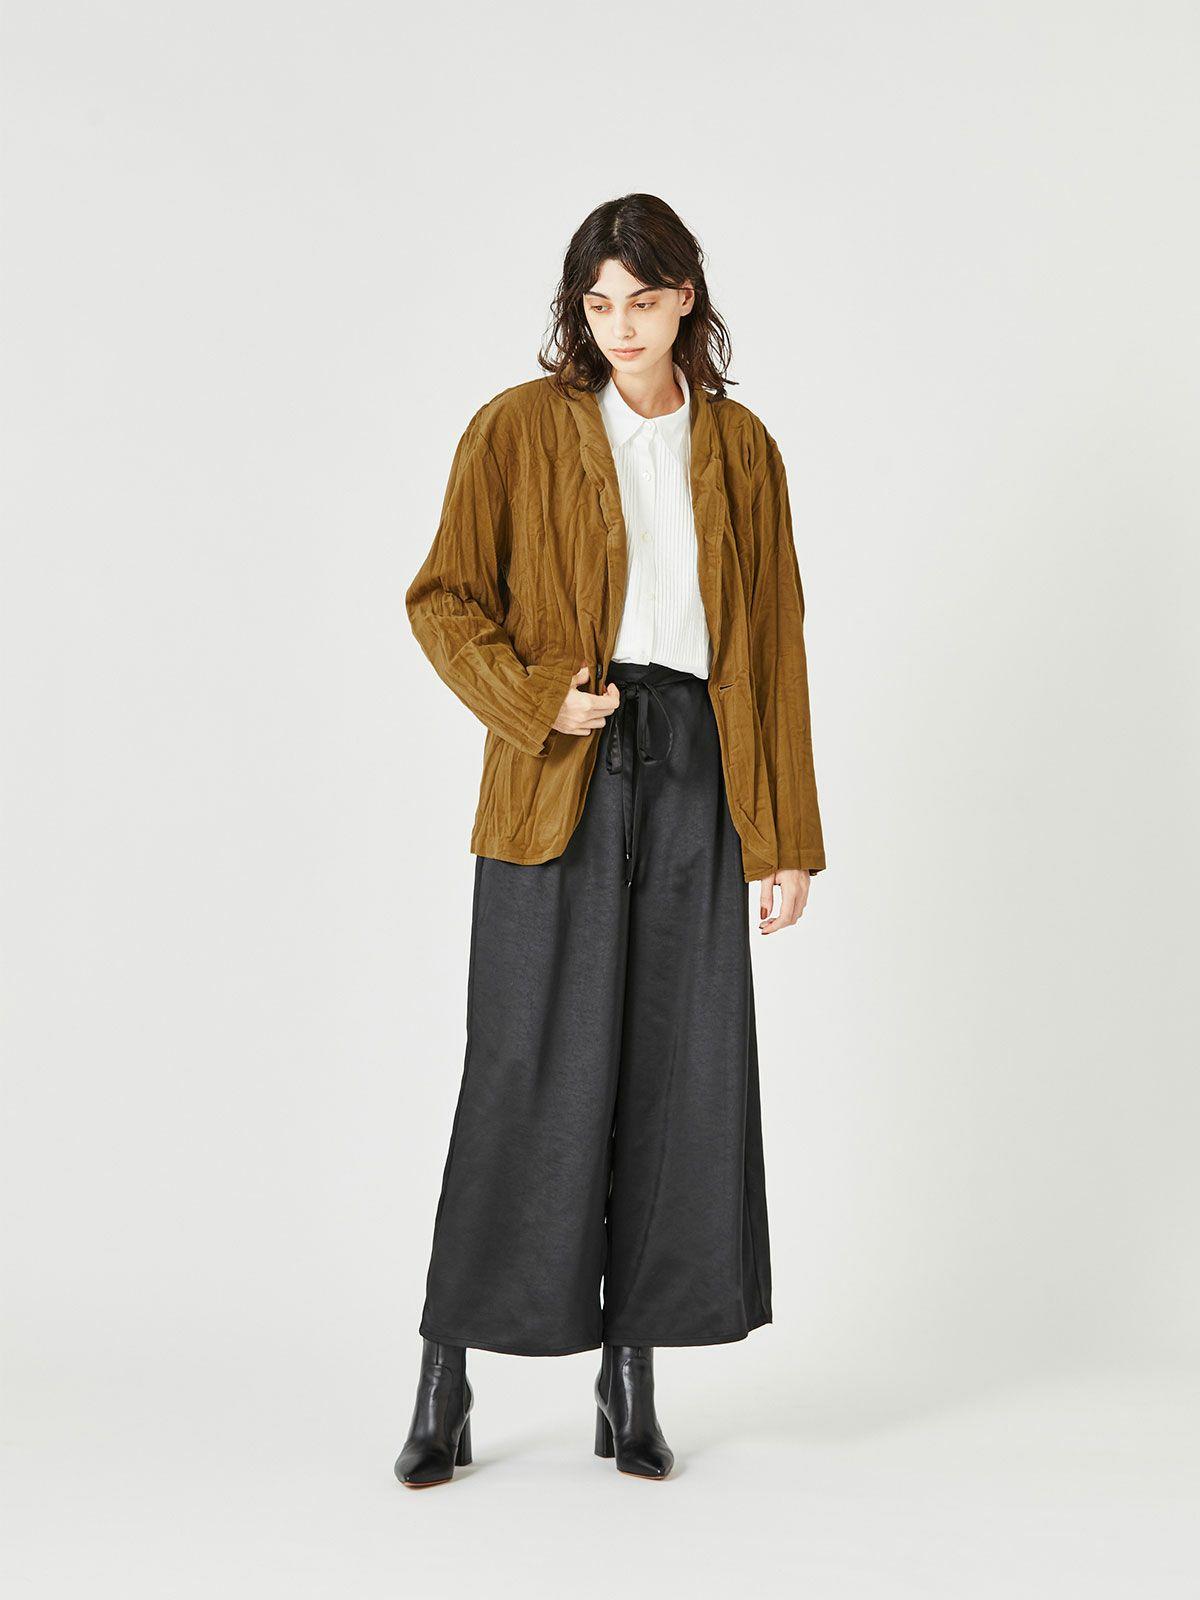 MIDUMISOLID for Ladies ツイストショールカラージャケット